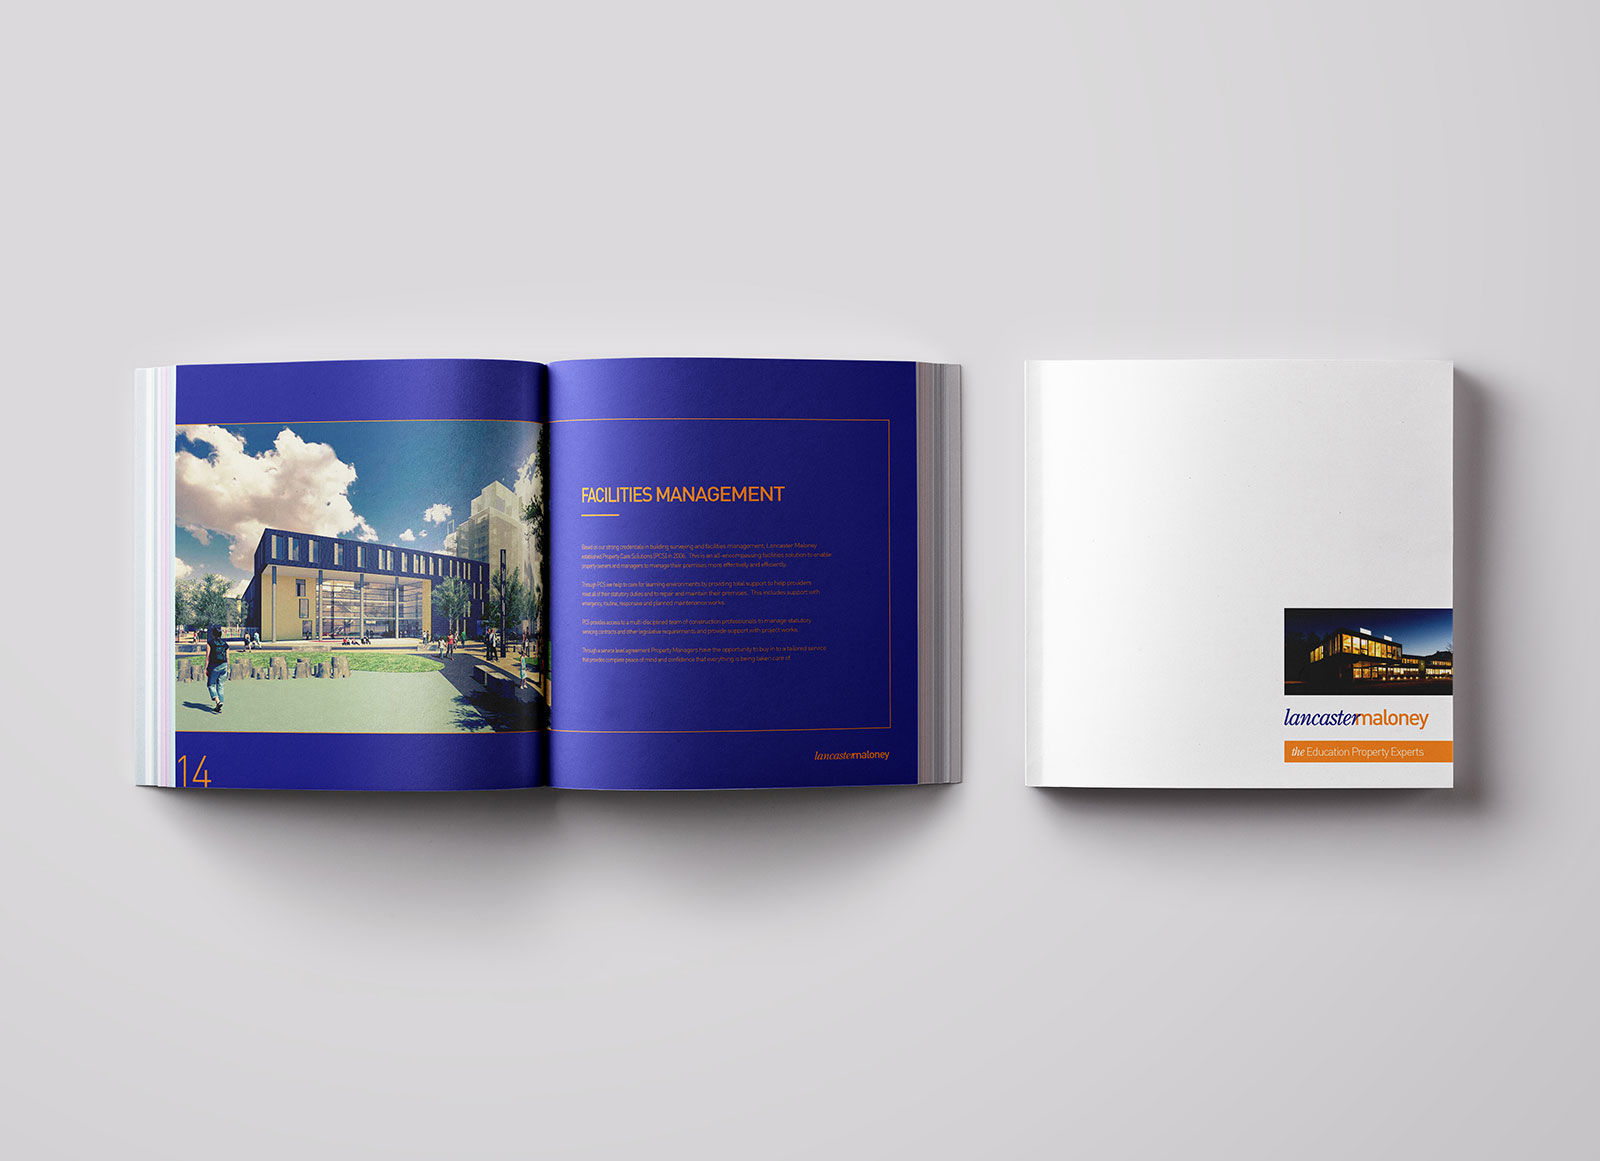 Free-Premium-Square-Magazine-Mockup-PSD-File-2